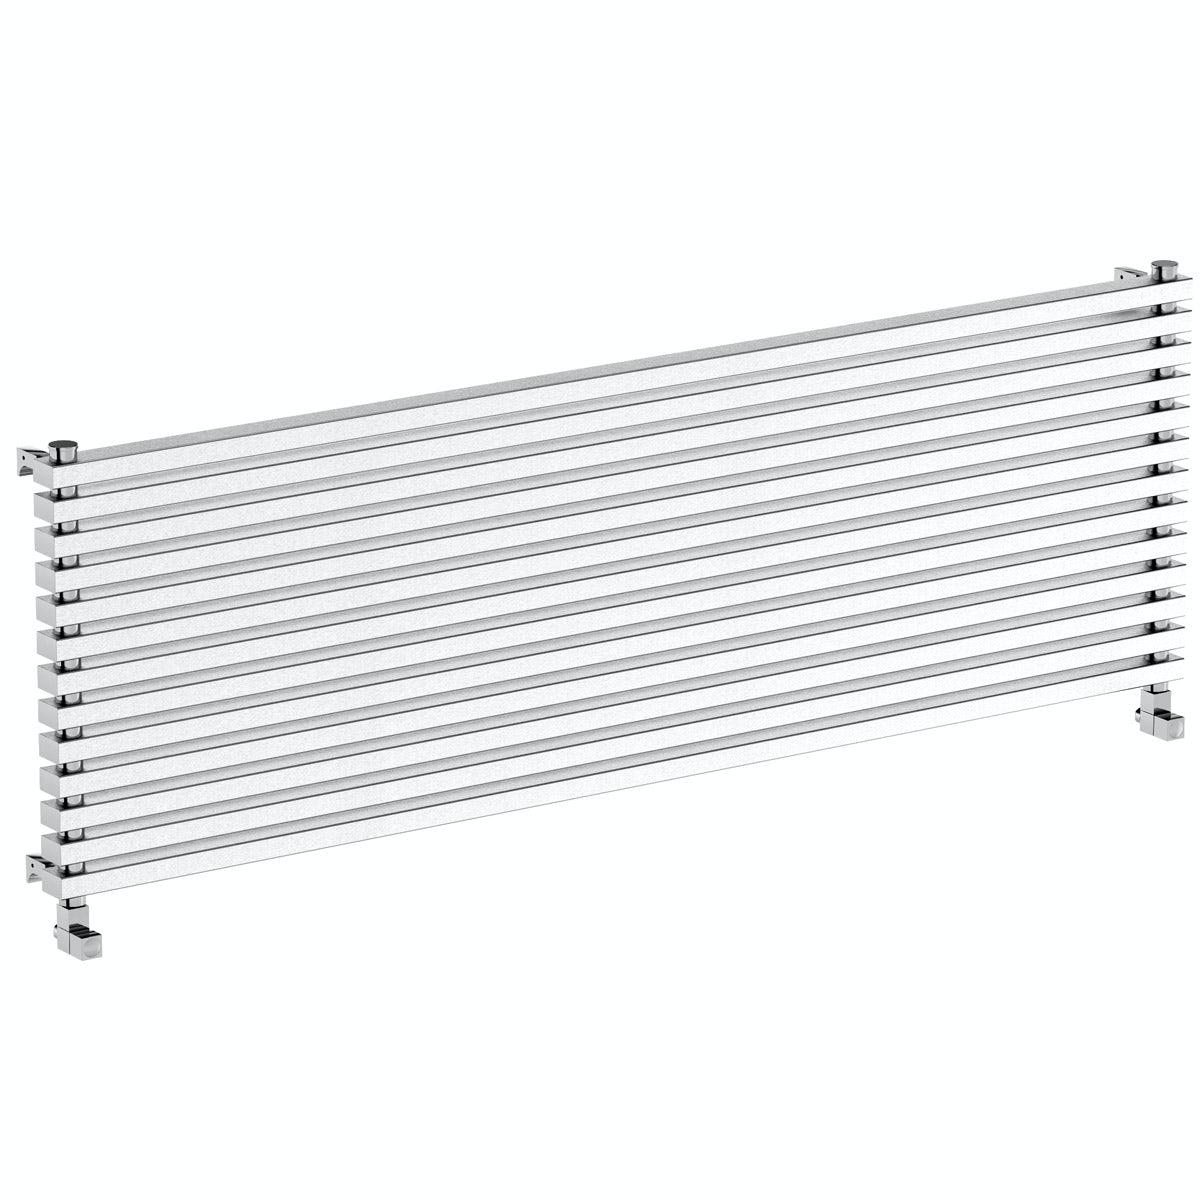 Mode Cadence horizontal radiator 600 x 1800